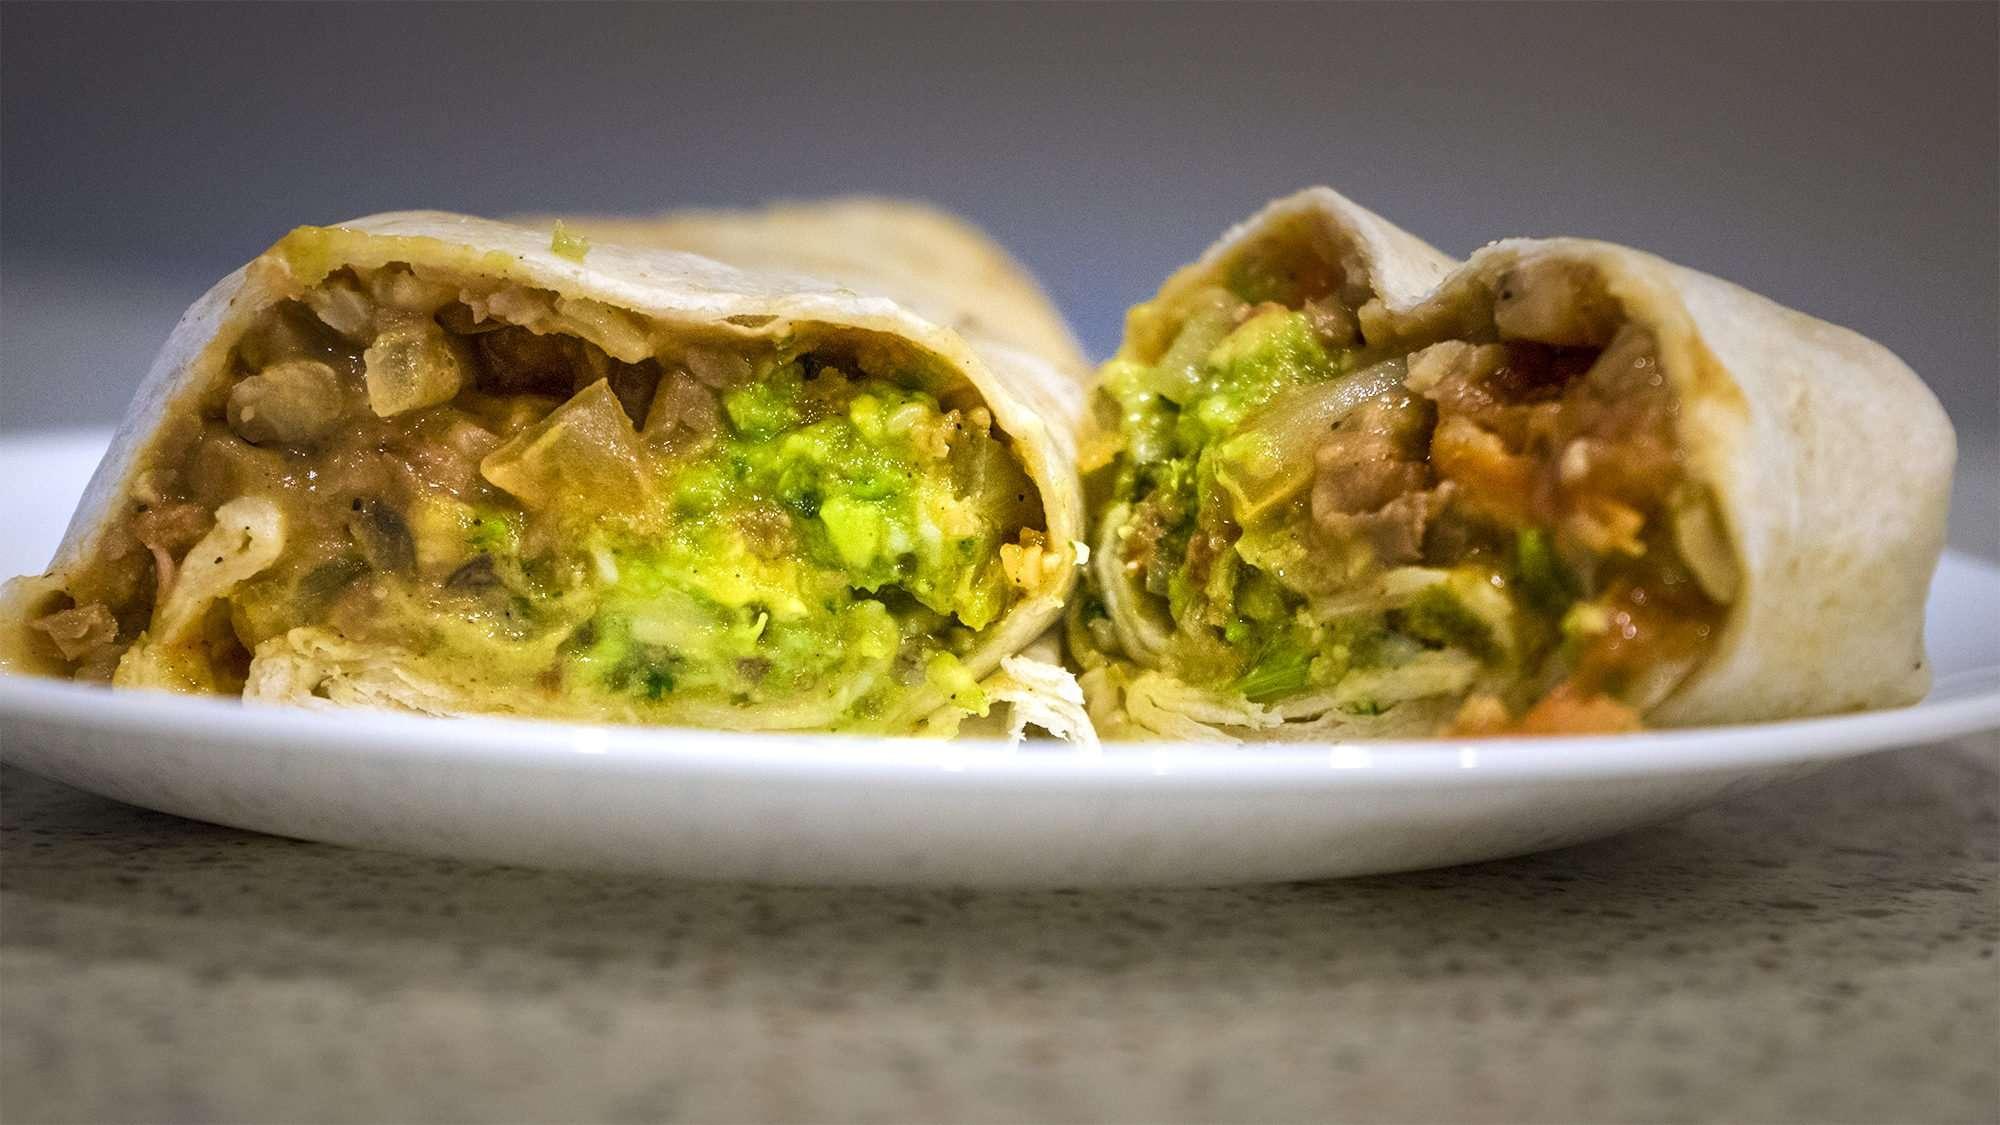 June 30, 2017 Burrito - Rice, Bean, Lettuce, Tomato, Boss Burrito food truck, Paducah, KY/photonews247.com